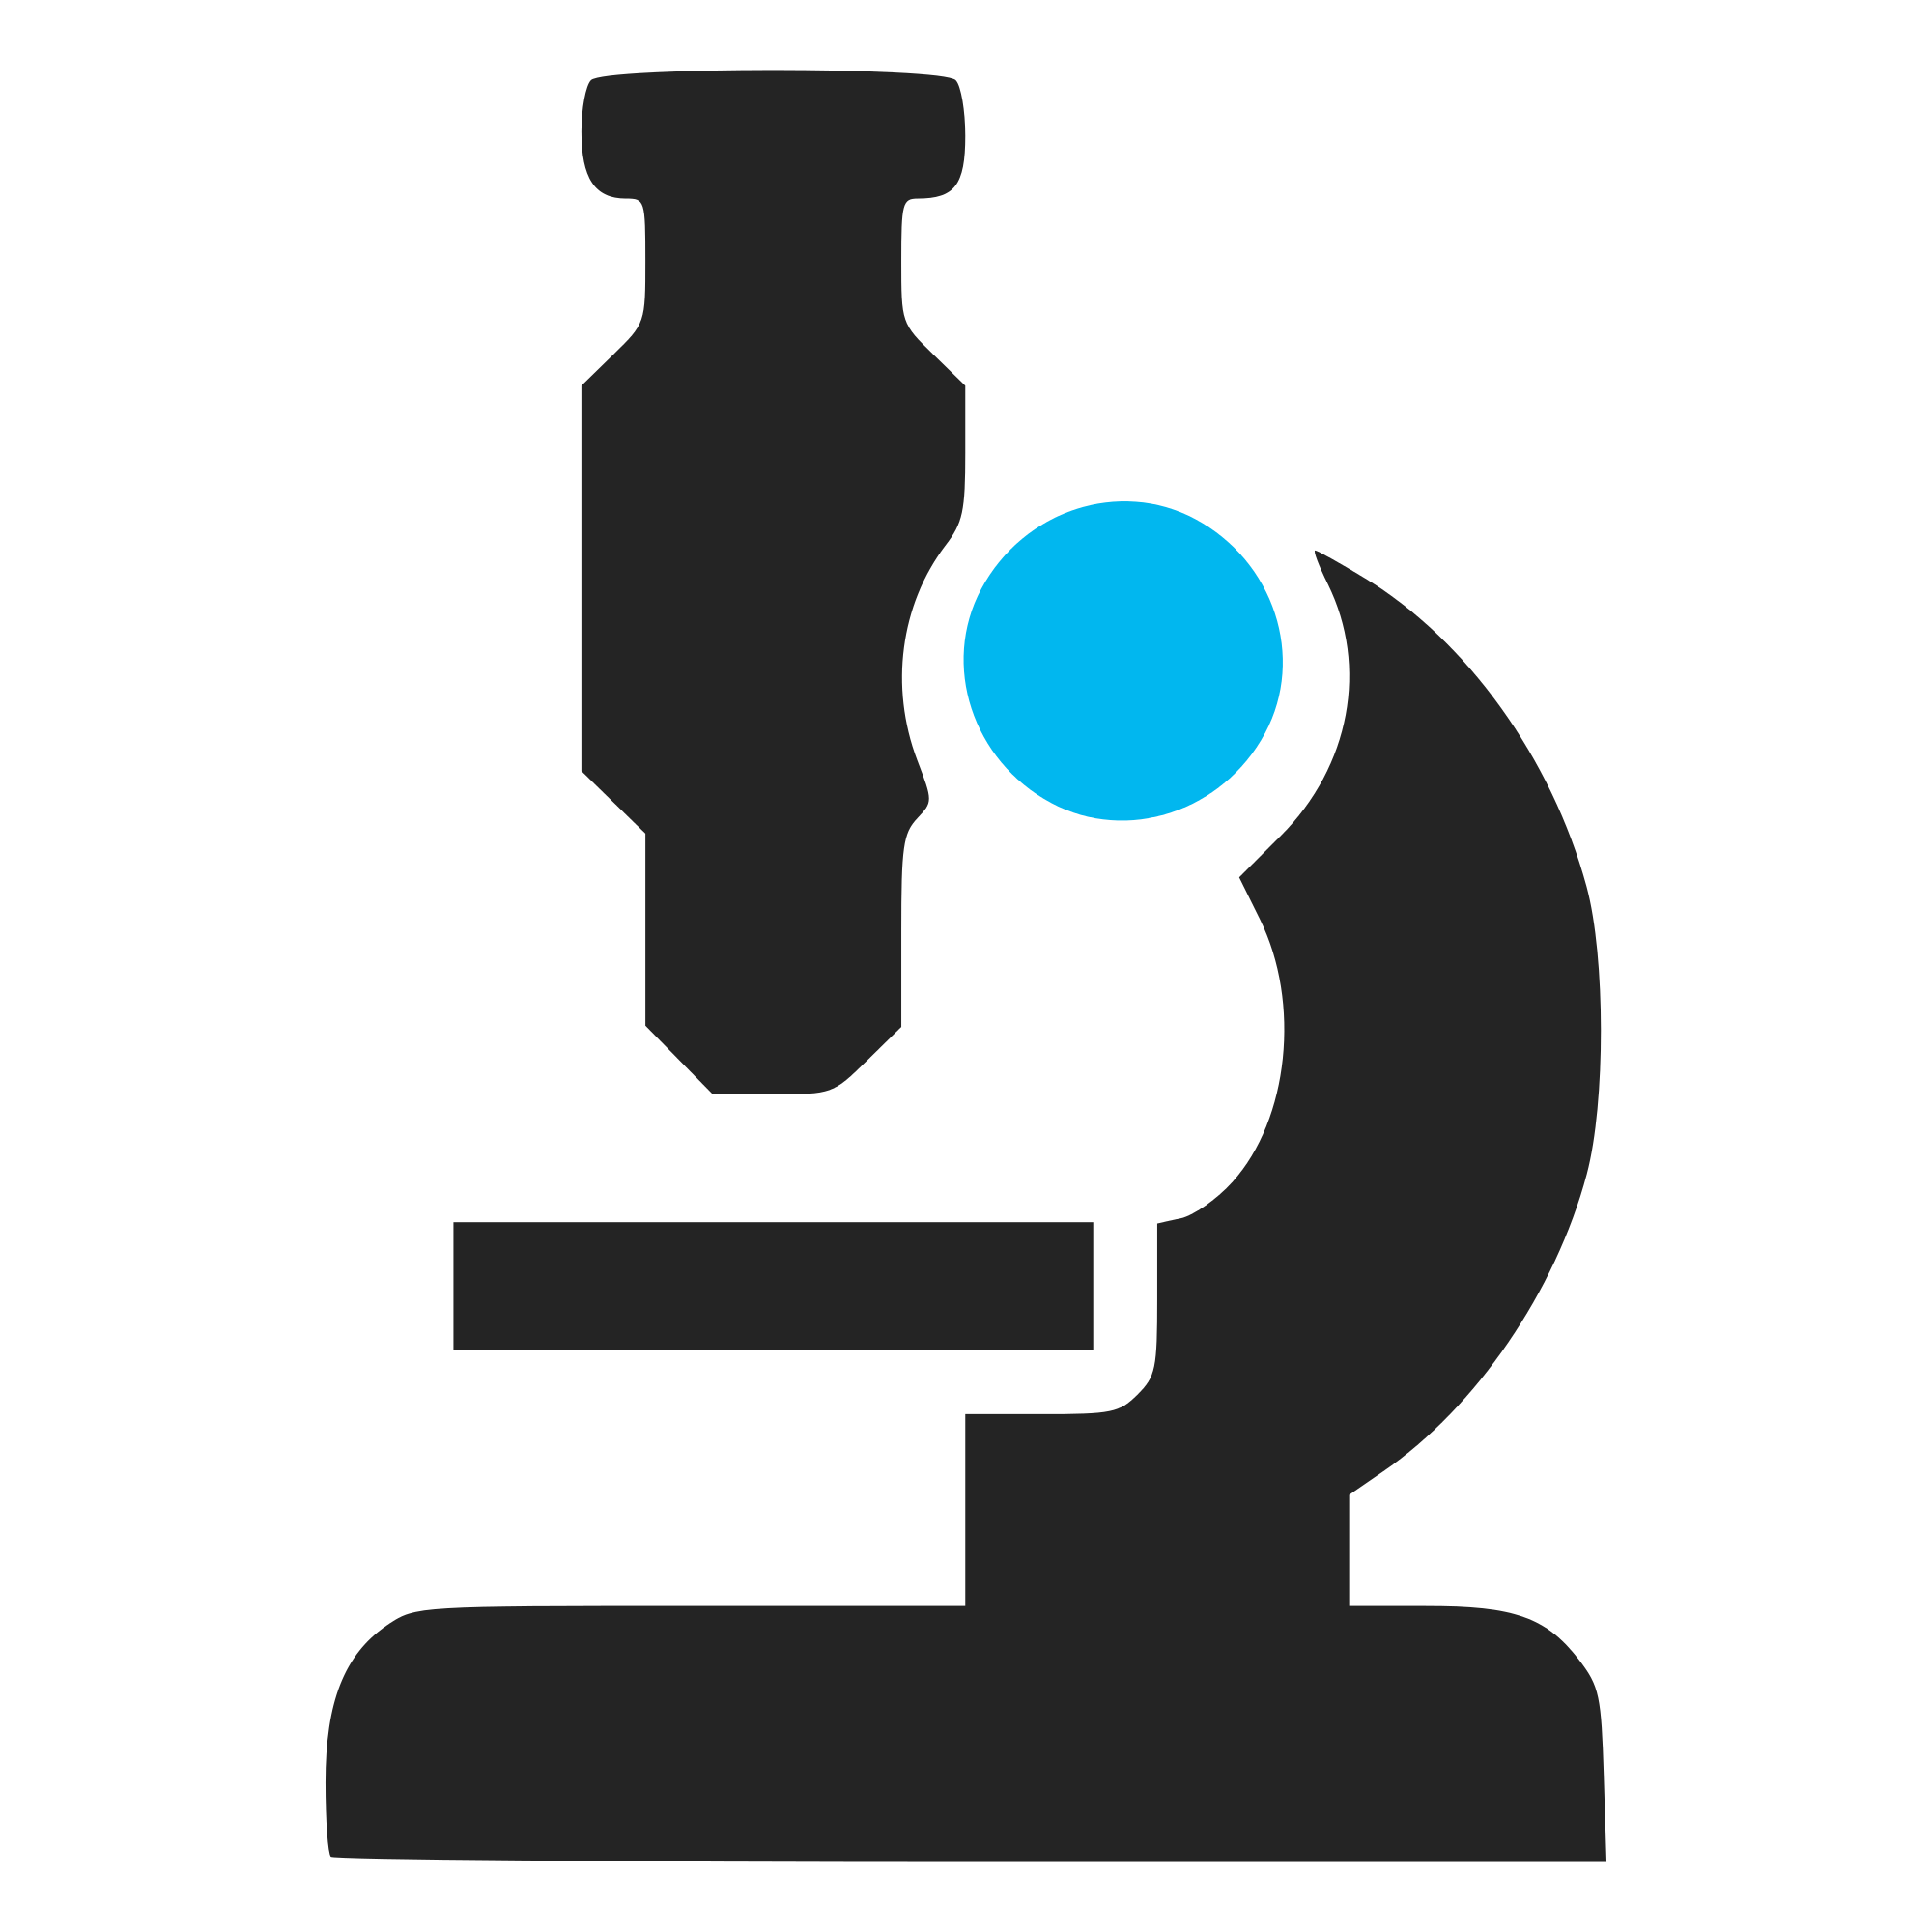 Microscope lab instrument